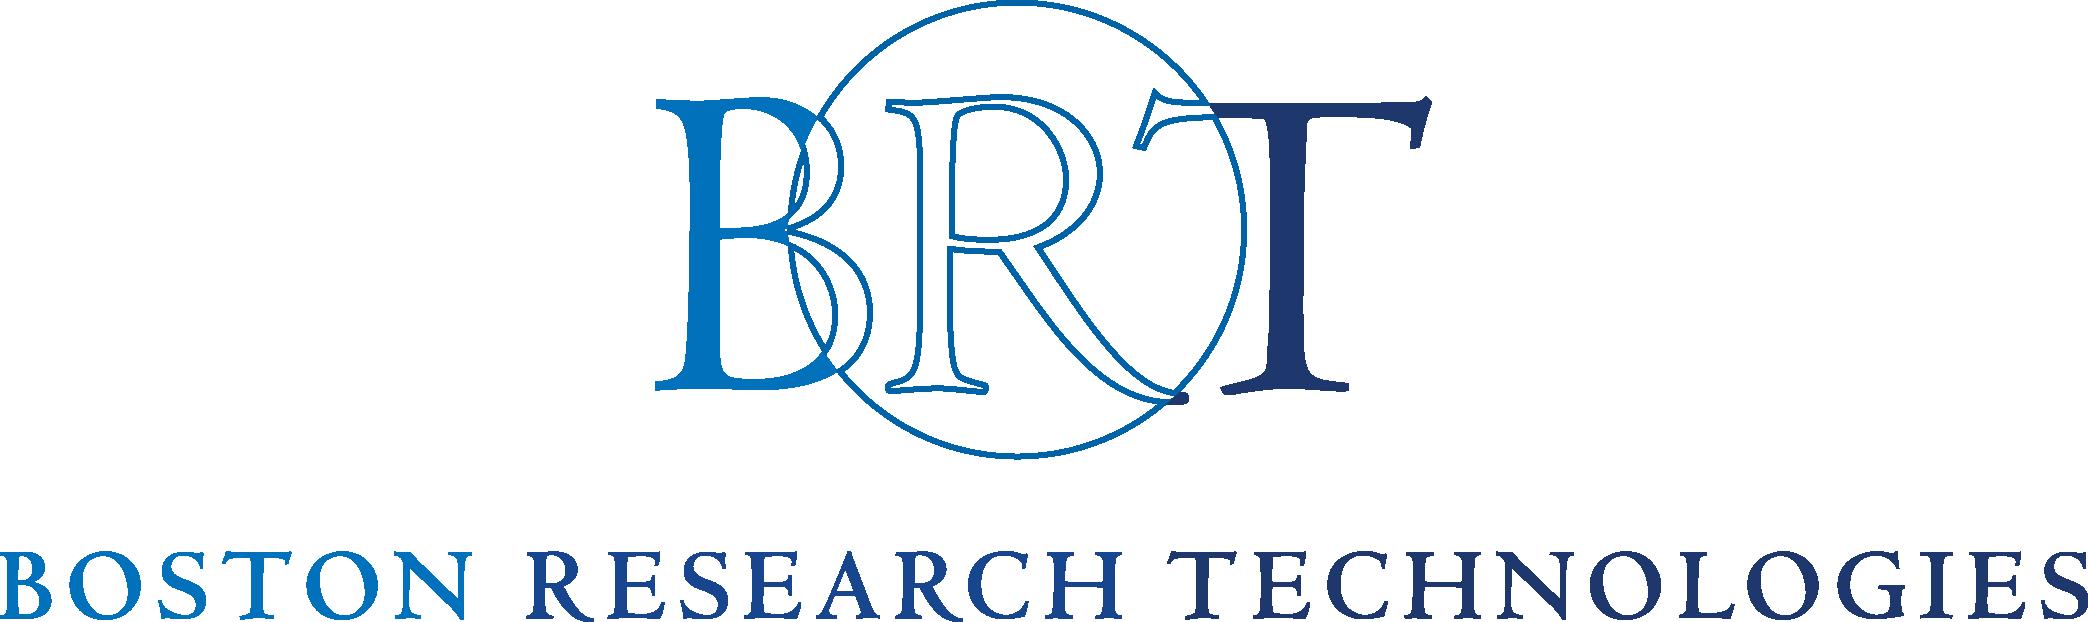 Boston Research Technologies